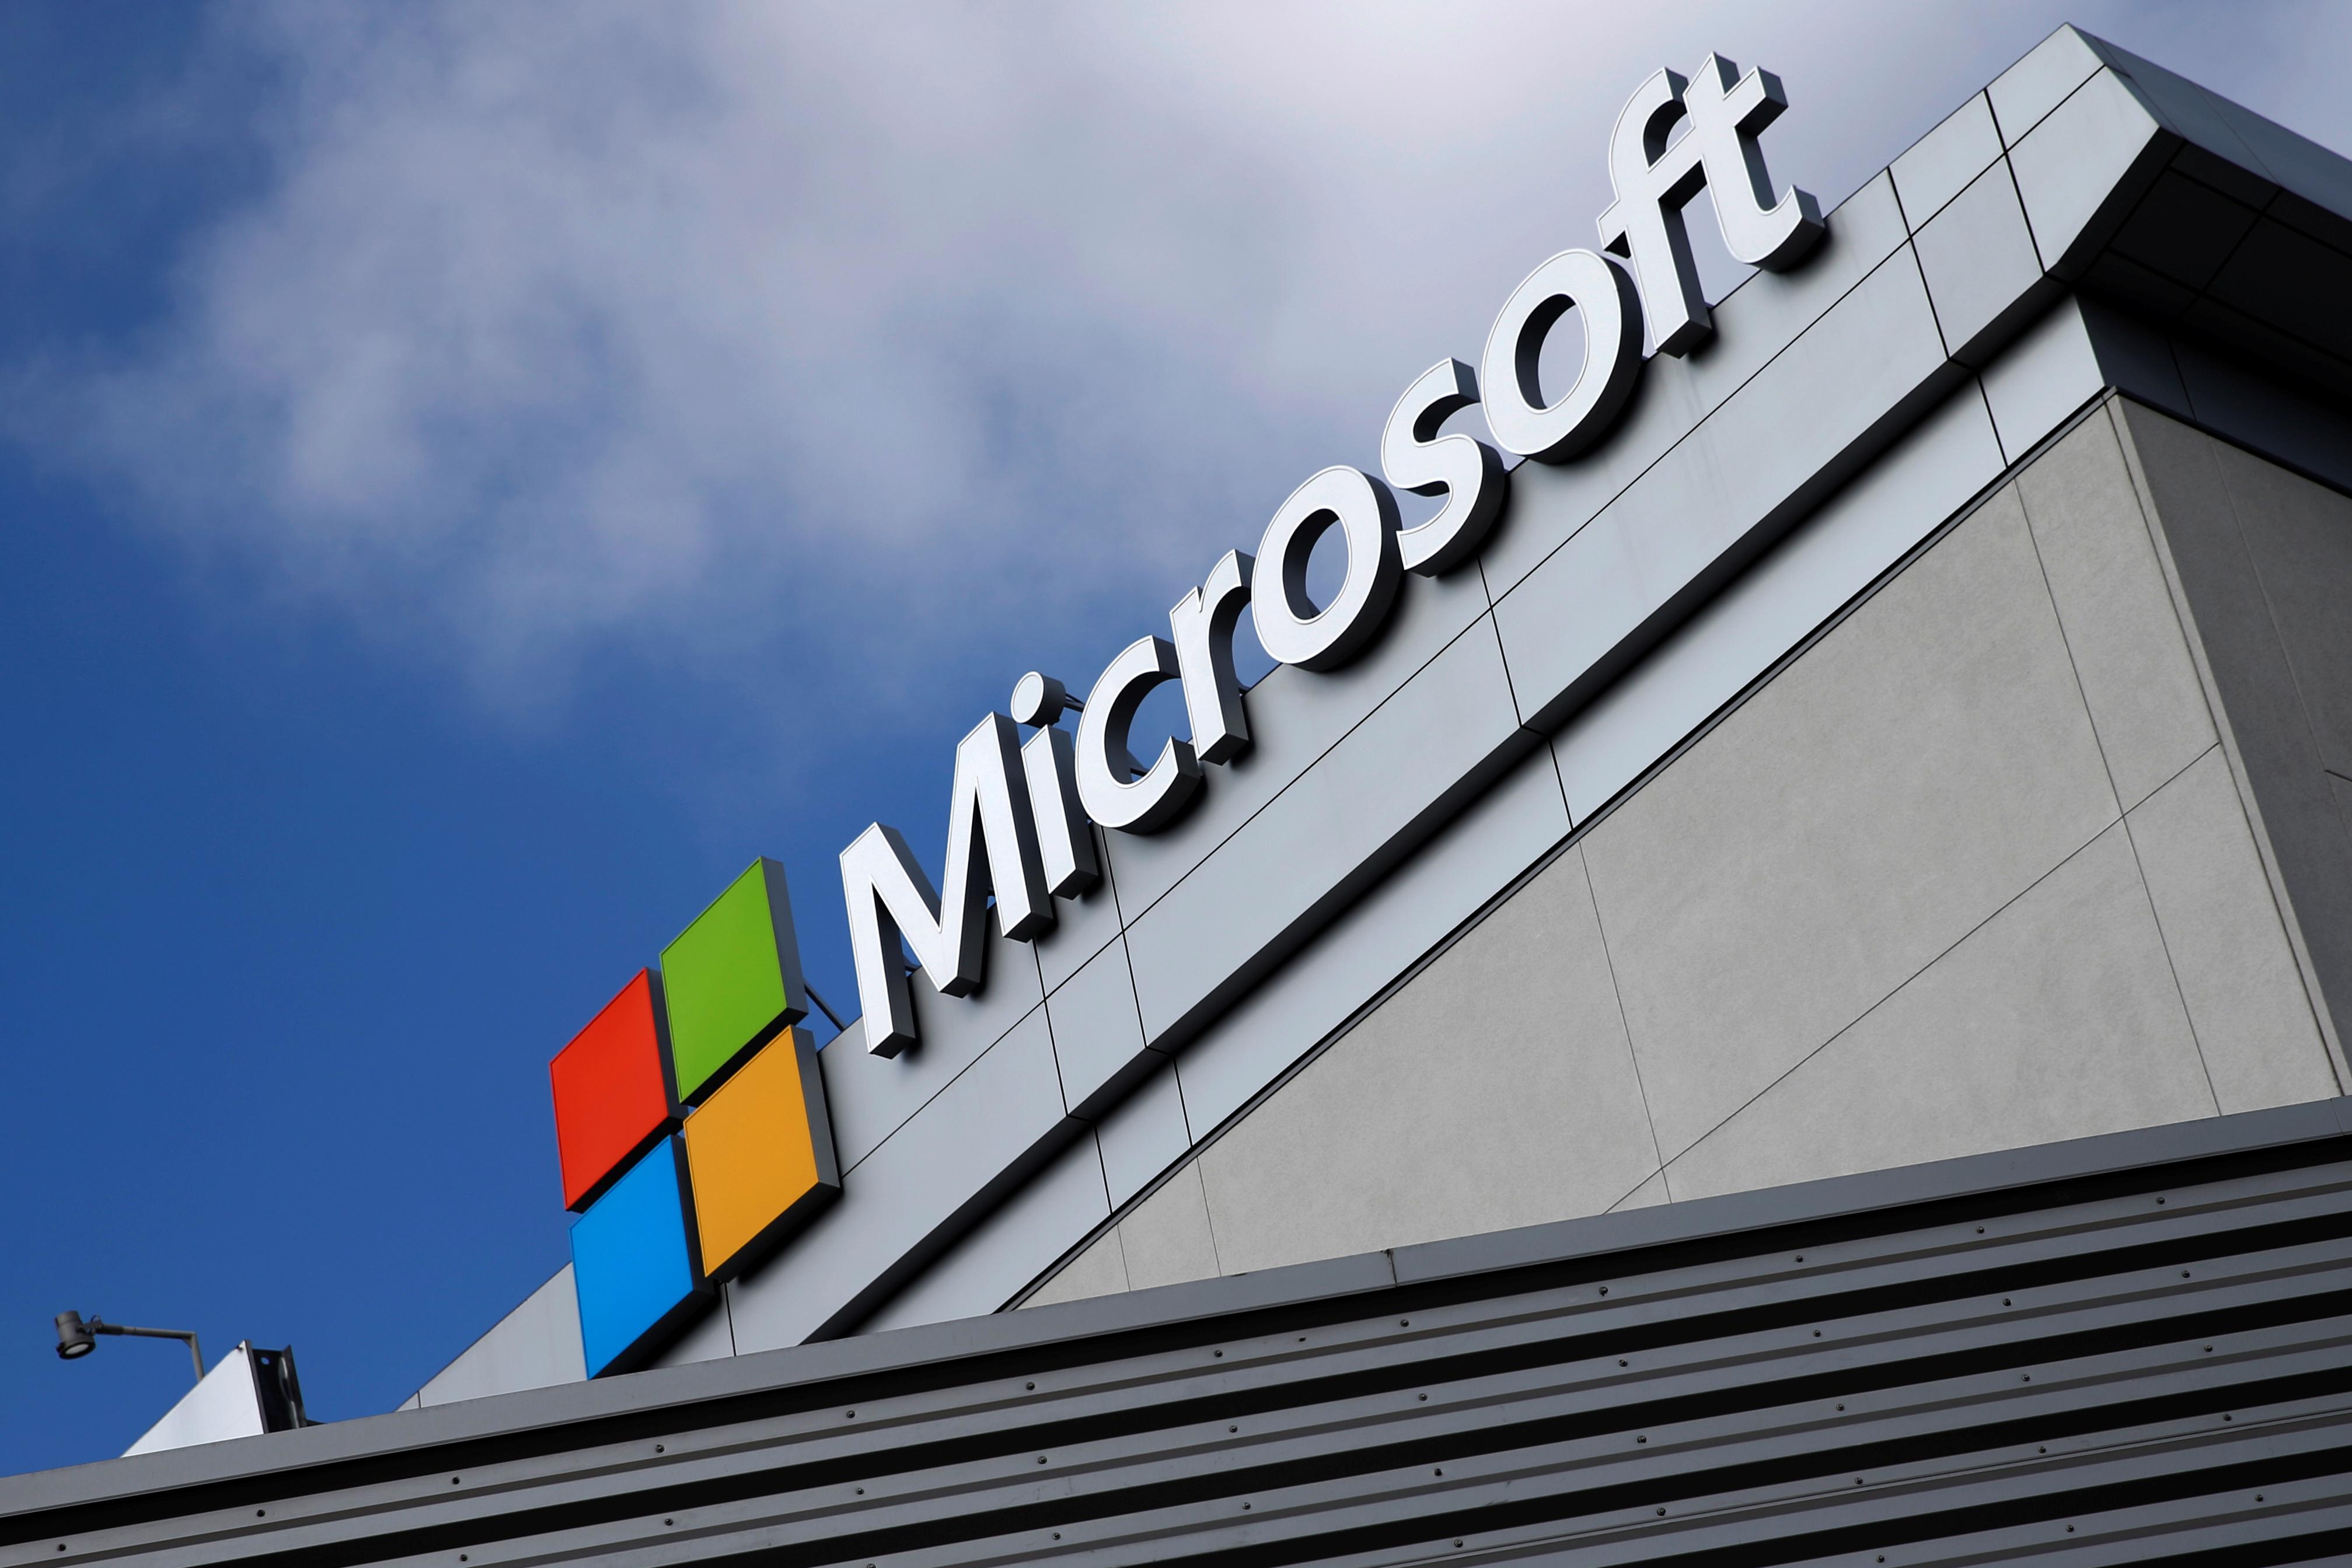 Apple, Microsoft, HP among companies shunning GOP convention | PBS